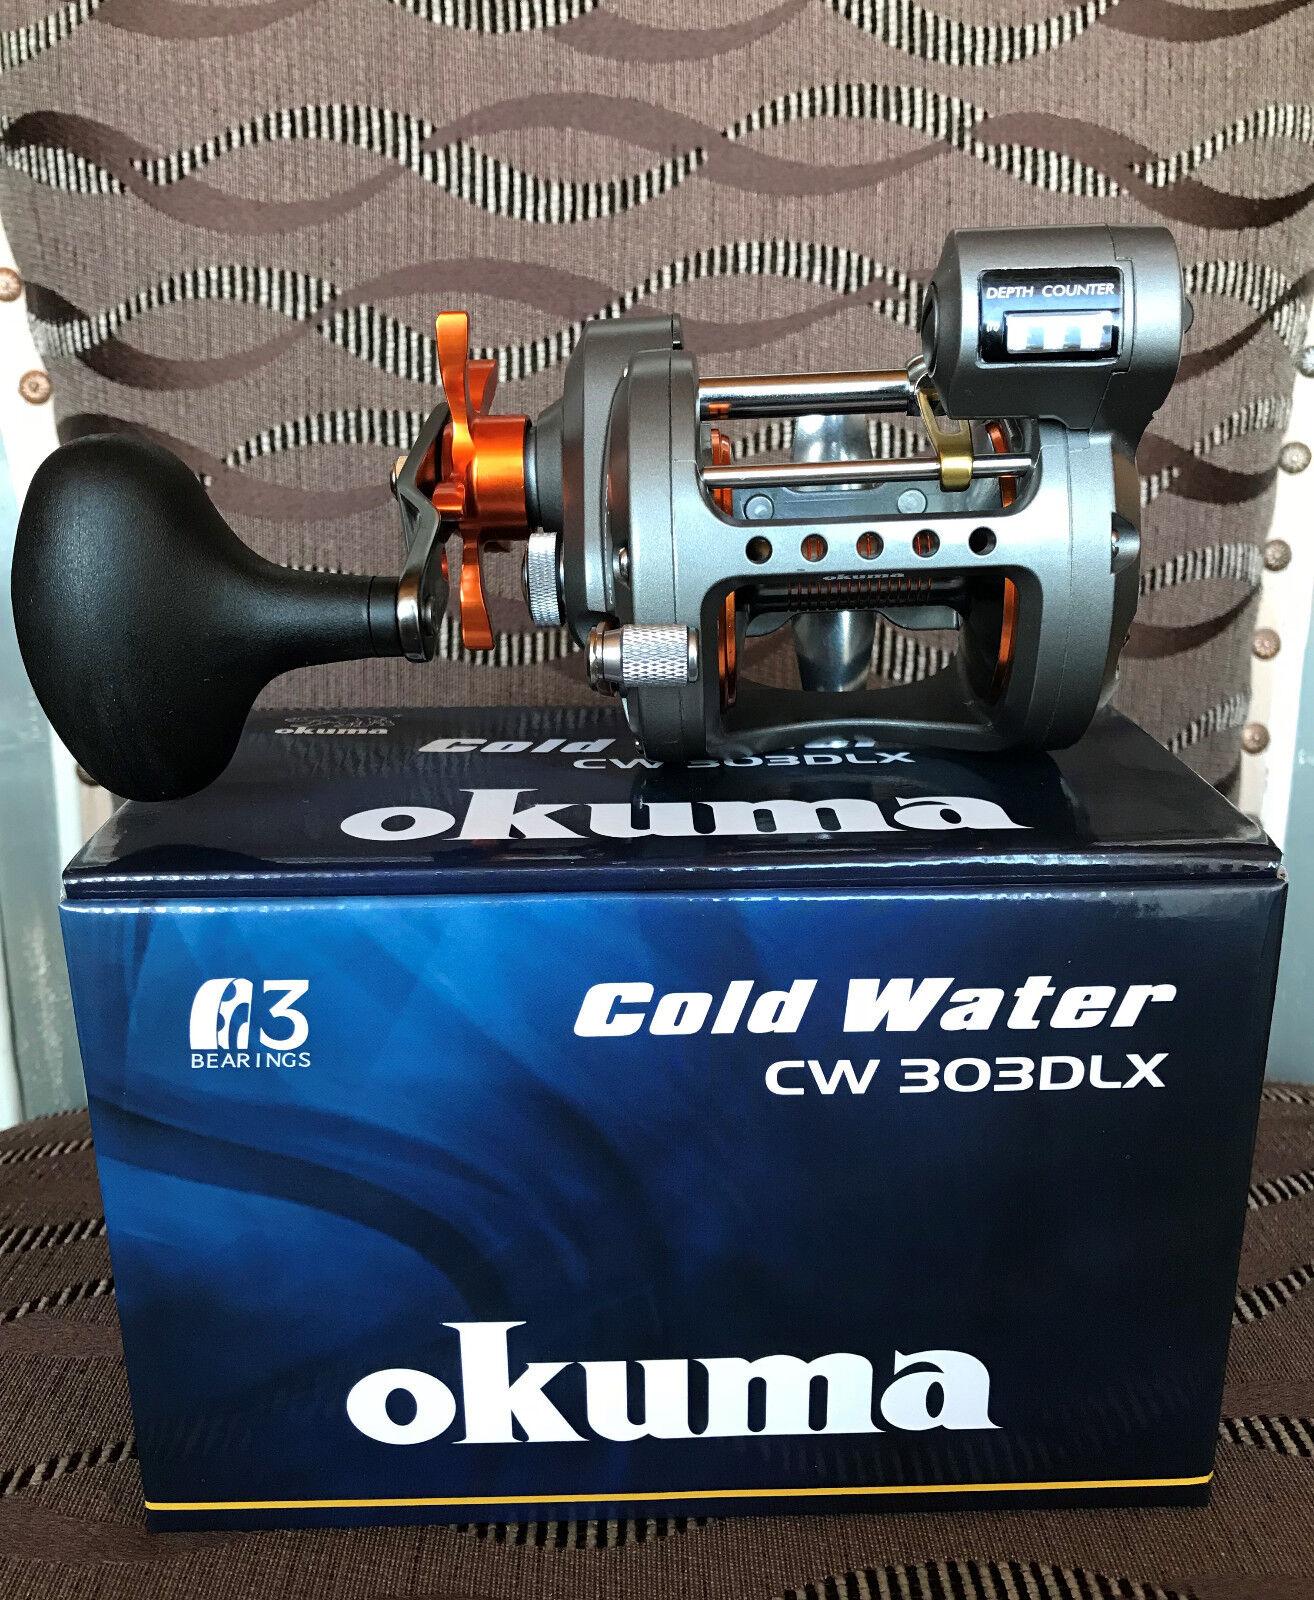 Okuma Cold Water CW-303DLX Linkshand Multirolle   no hesitation!buy now!